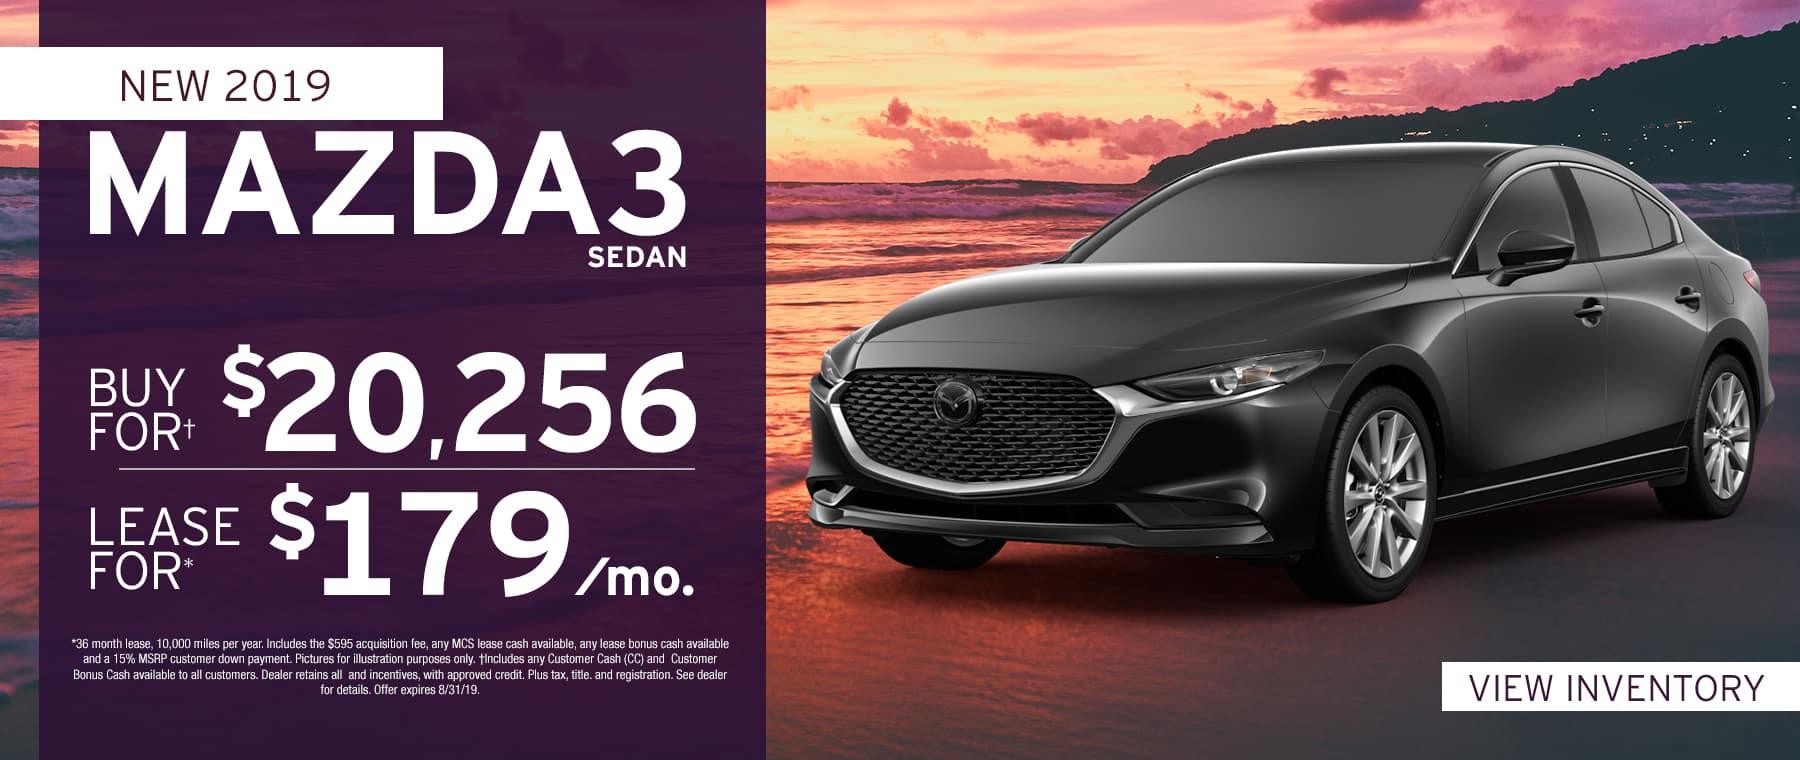 2019 Mazda3 Sedan$179 Per Month OR Buy For $20256